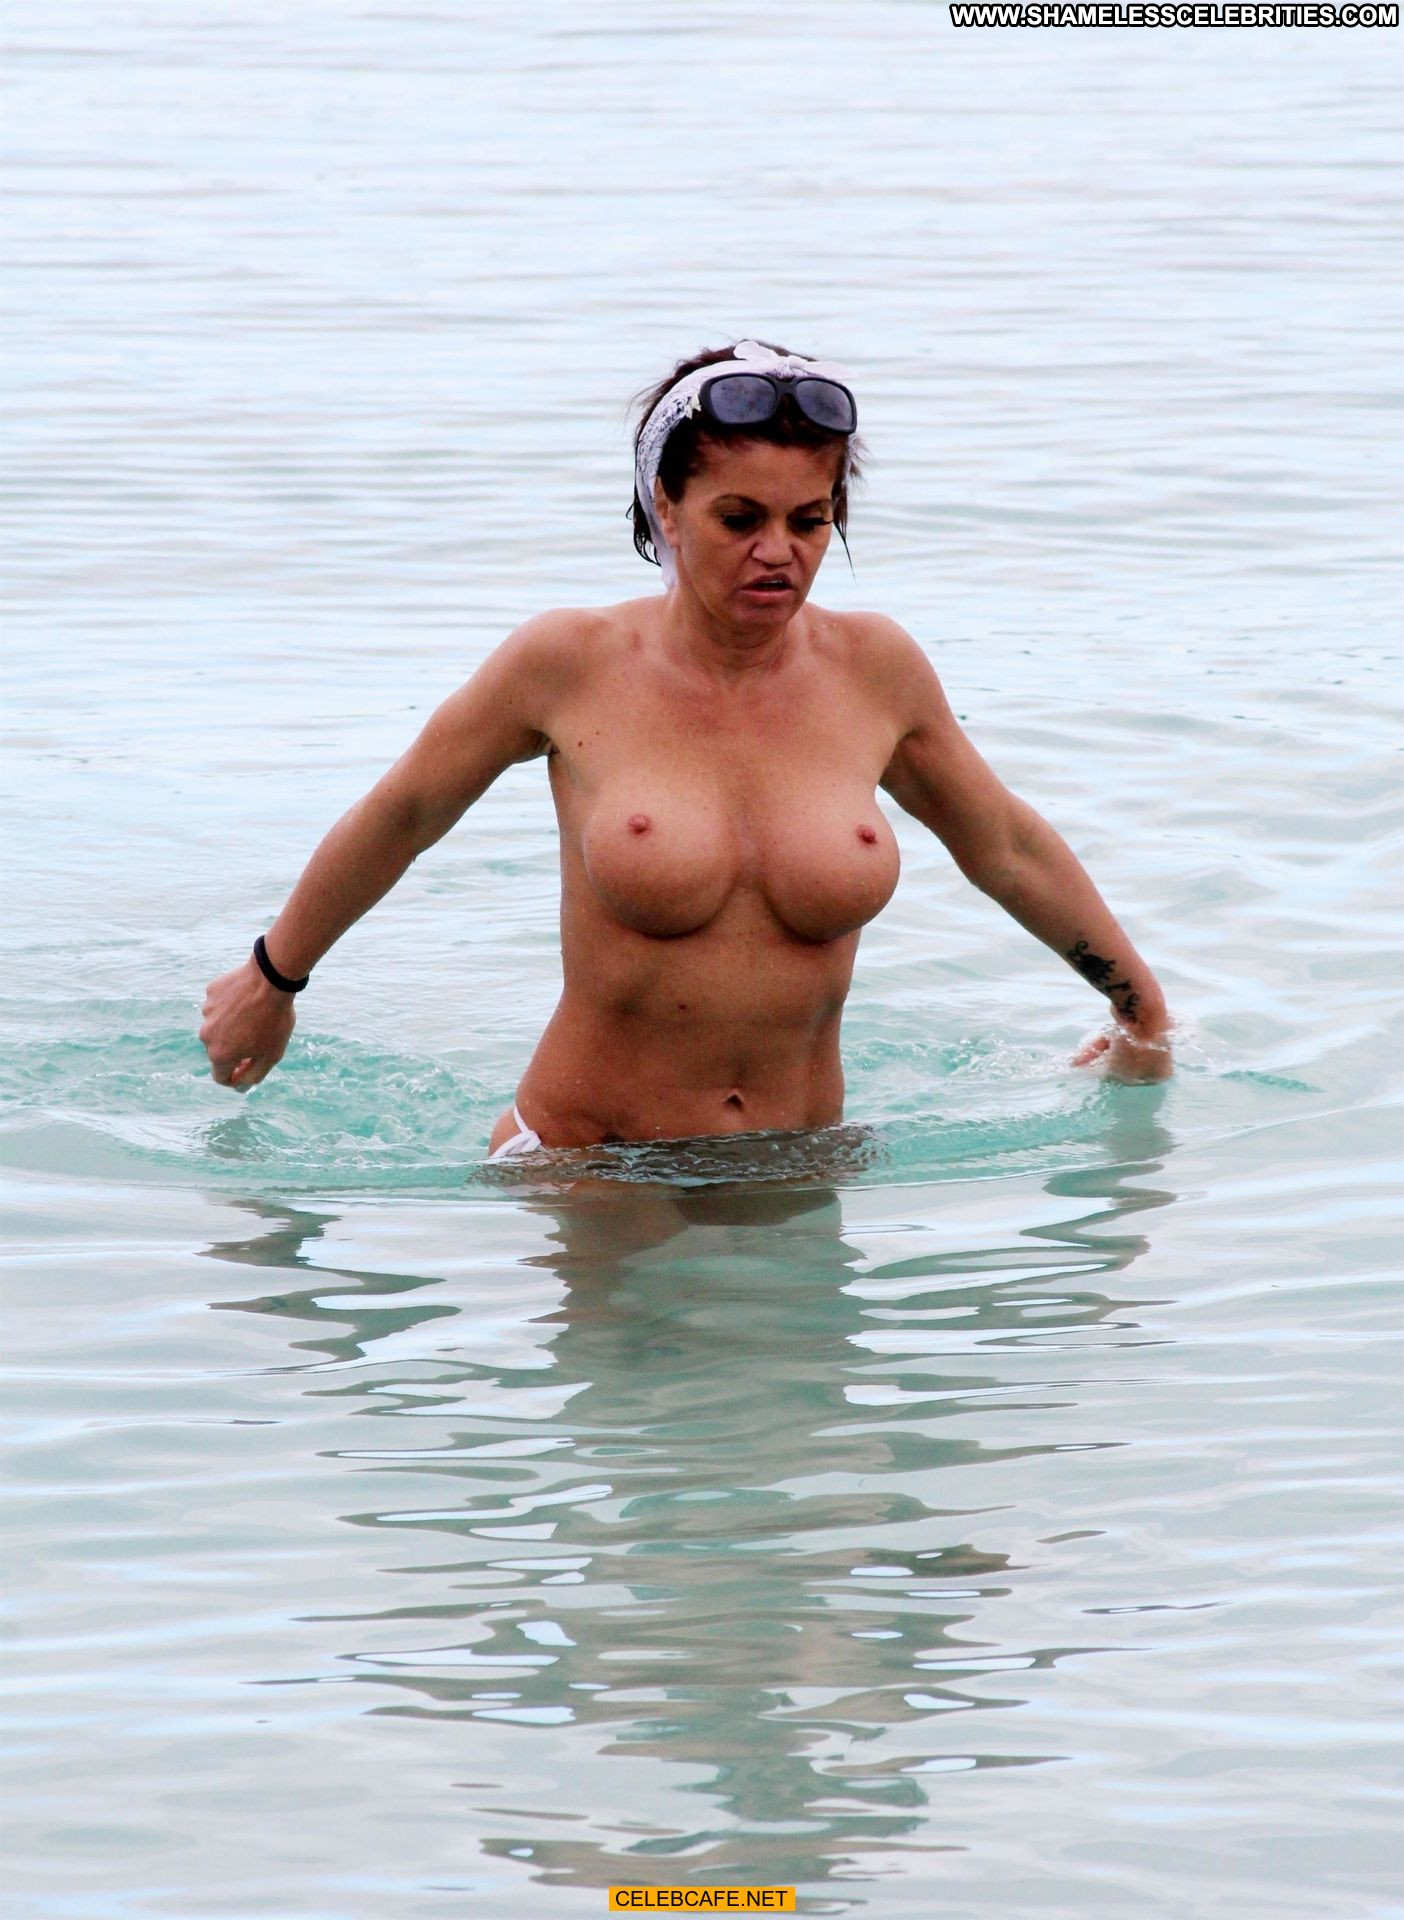 Celebrities Spain Topless